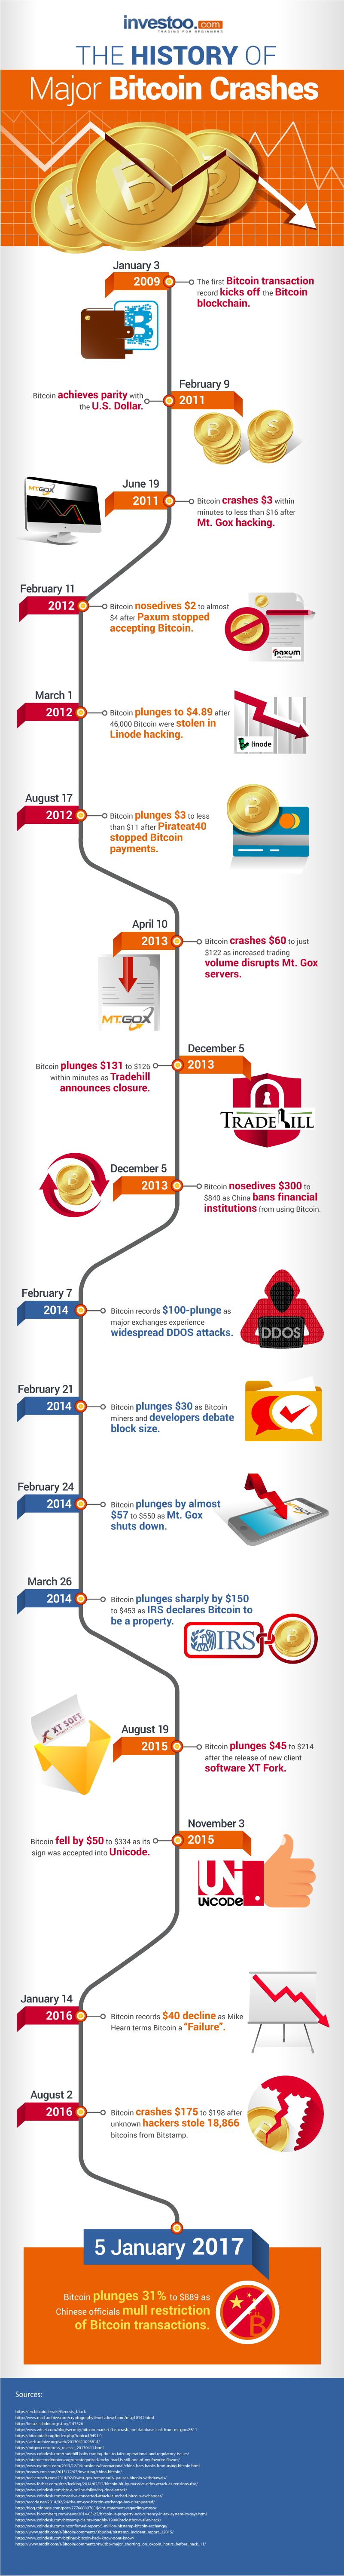 Investoo-History-of-Major-Bitcoin-Crashes_IGDT_d14d52d25d46_1a